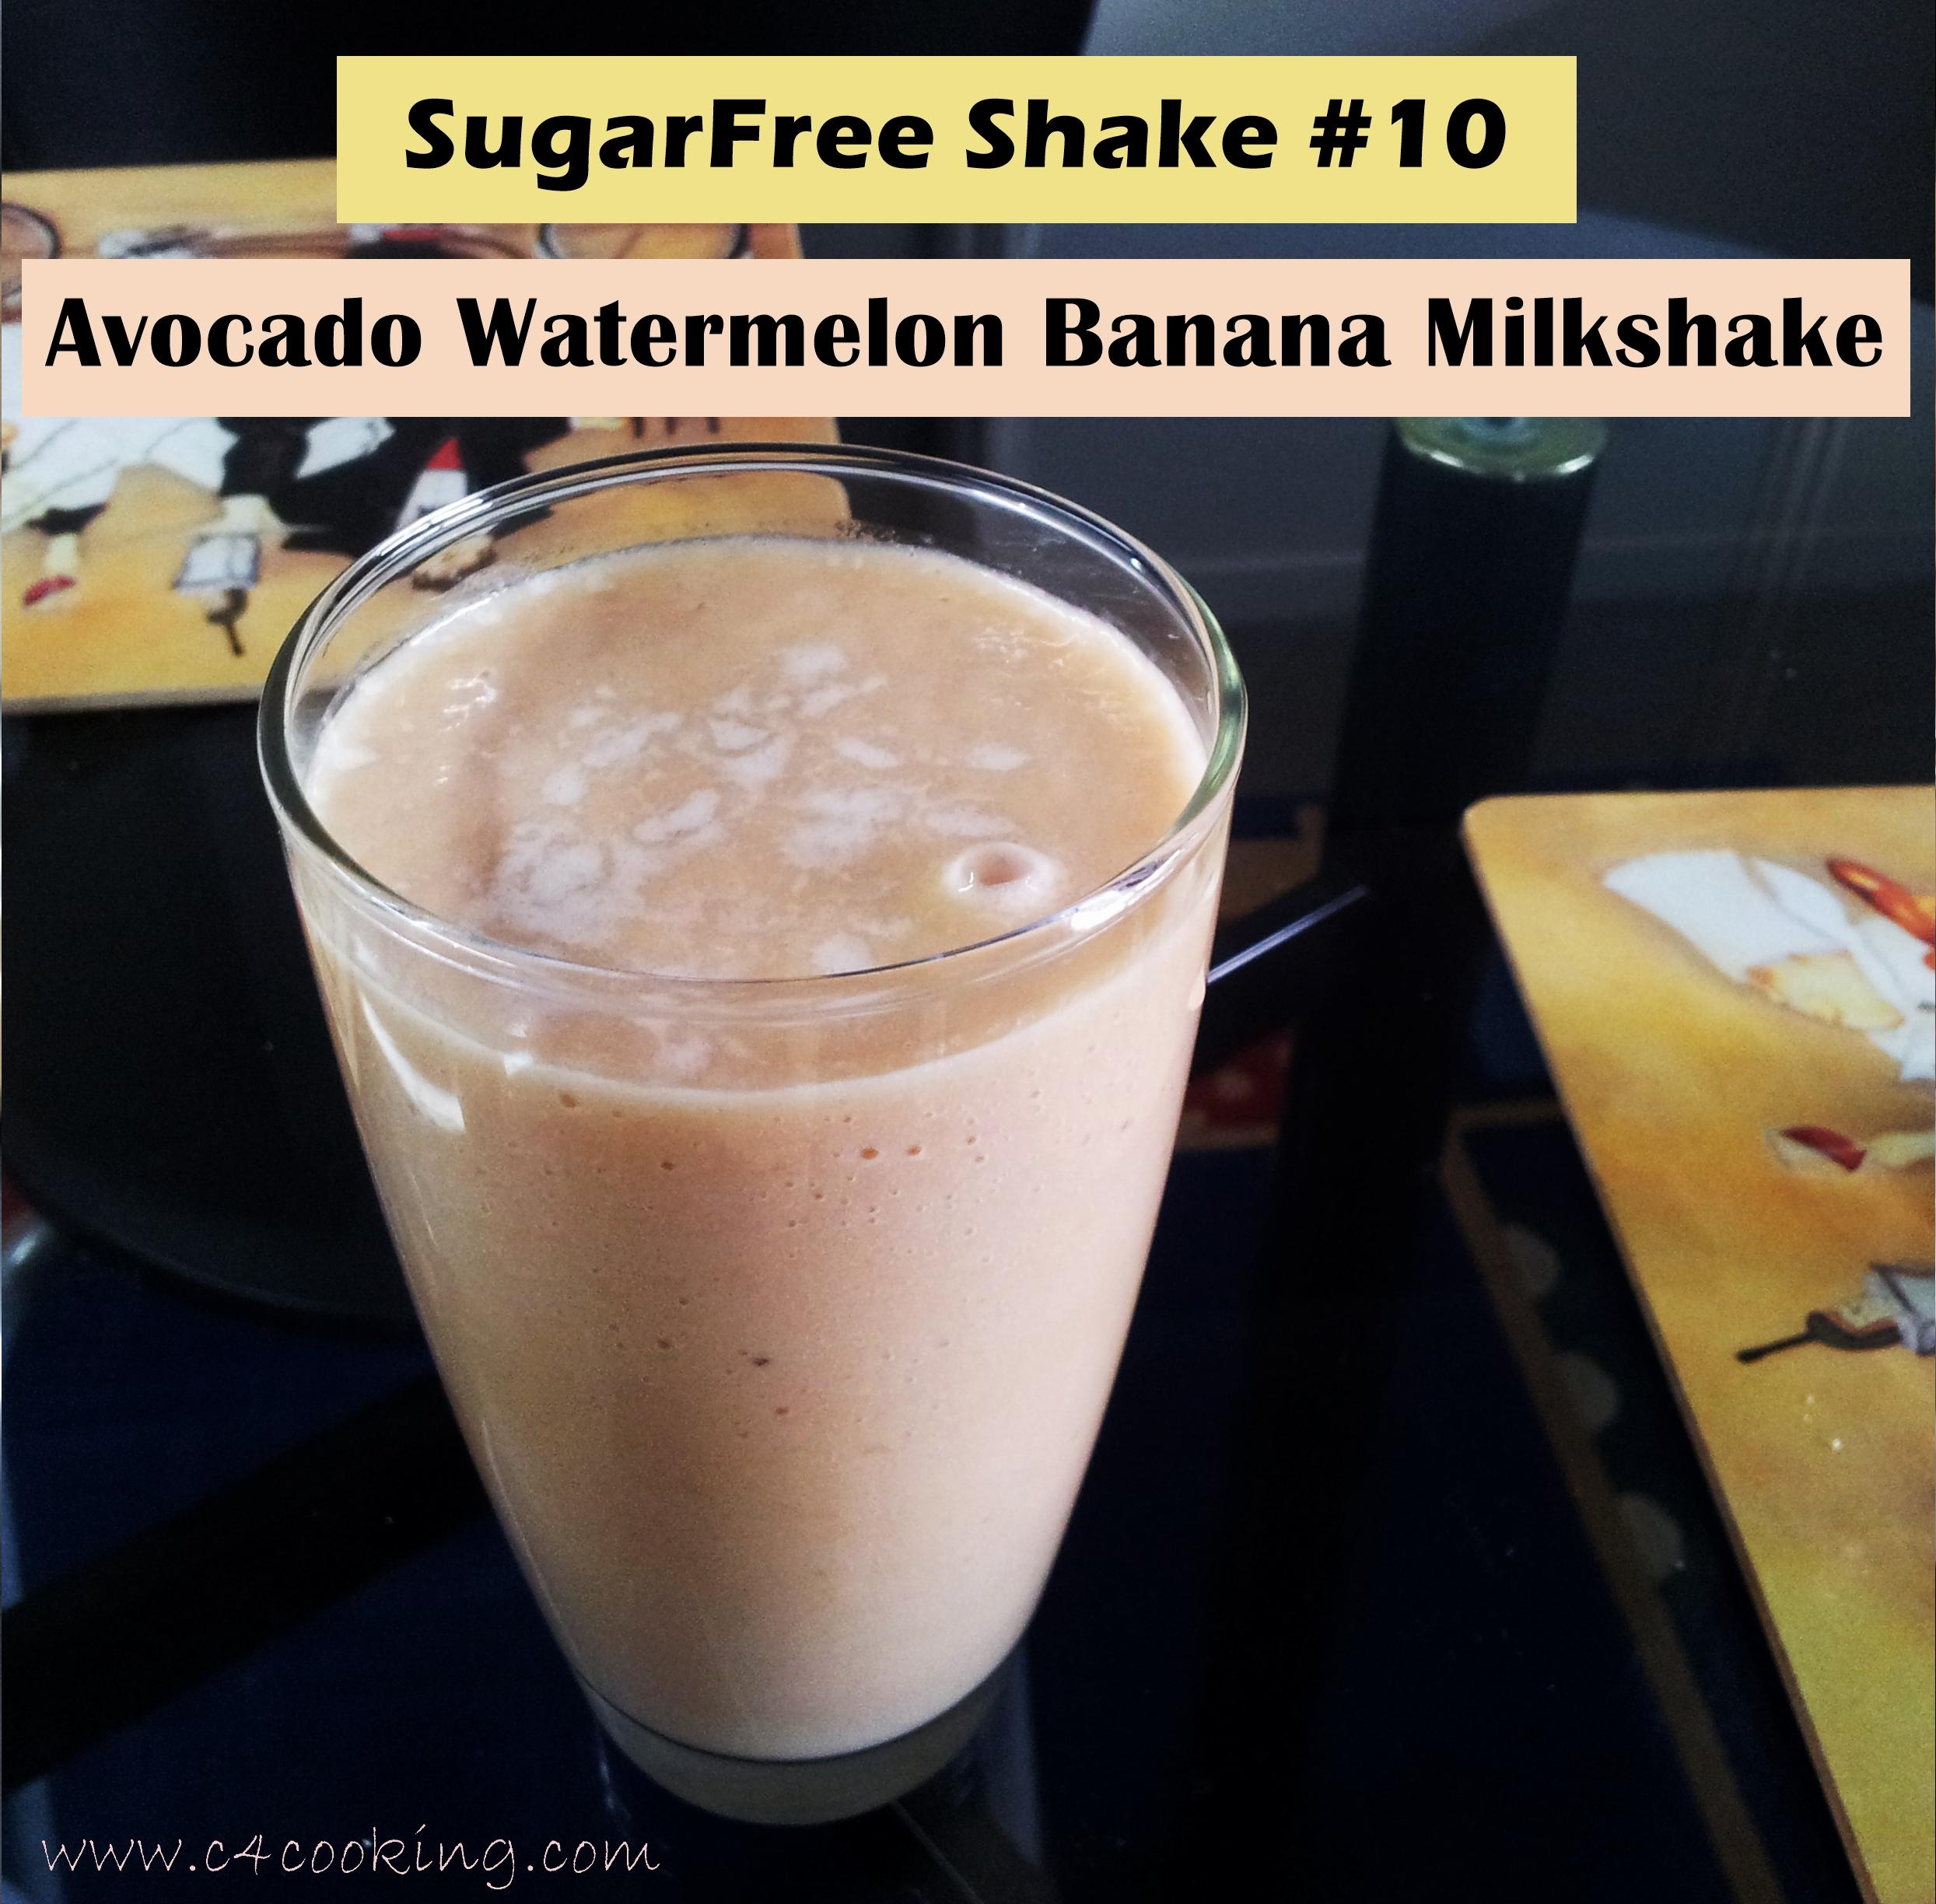 avocado watermelon banana milkshake, sugarfree drinks, c4cooking